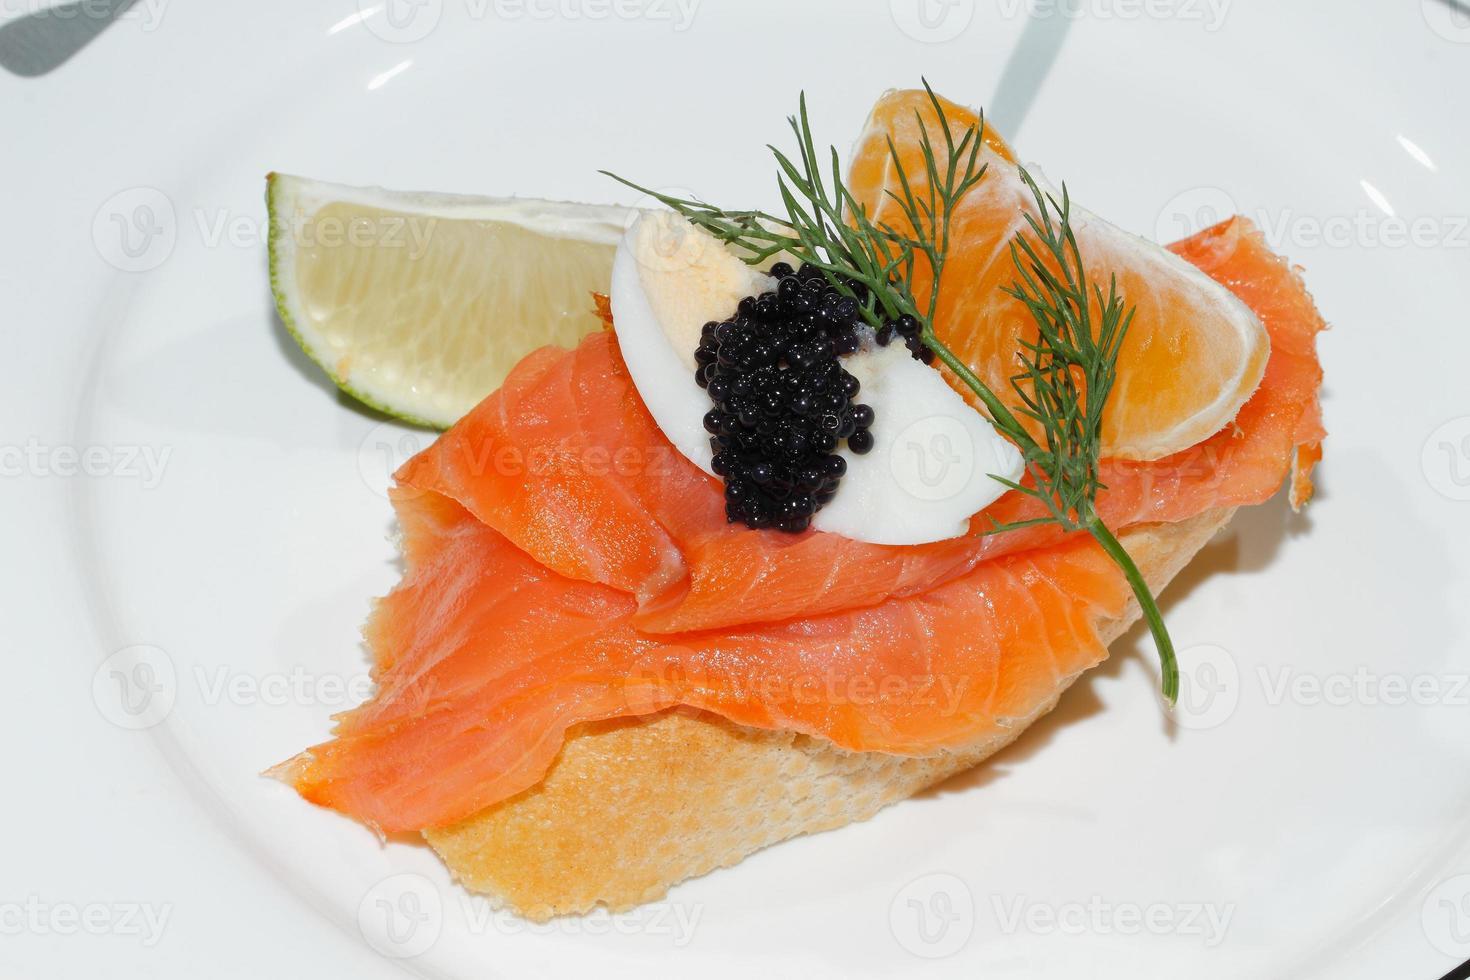 Baguette, smoked salmon, egg, caviar, orange photo